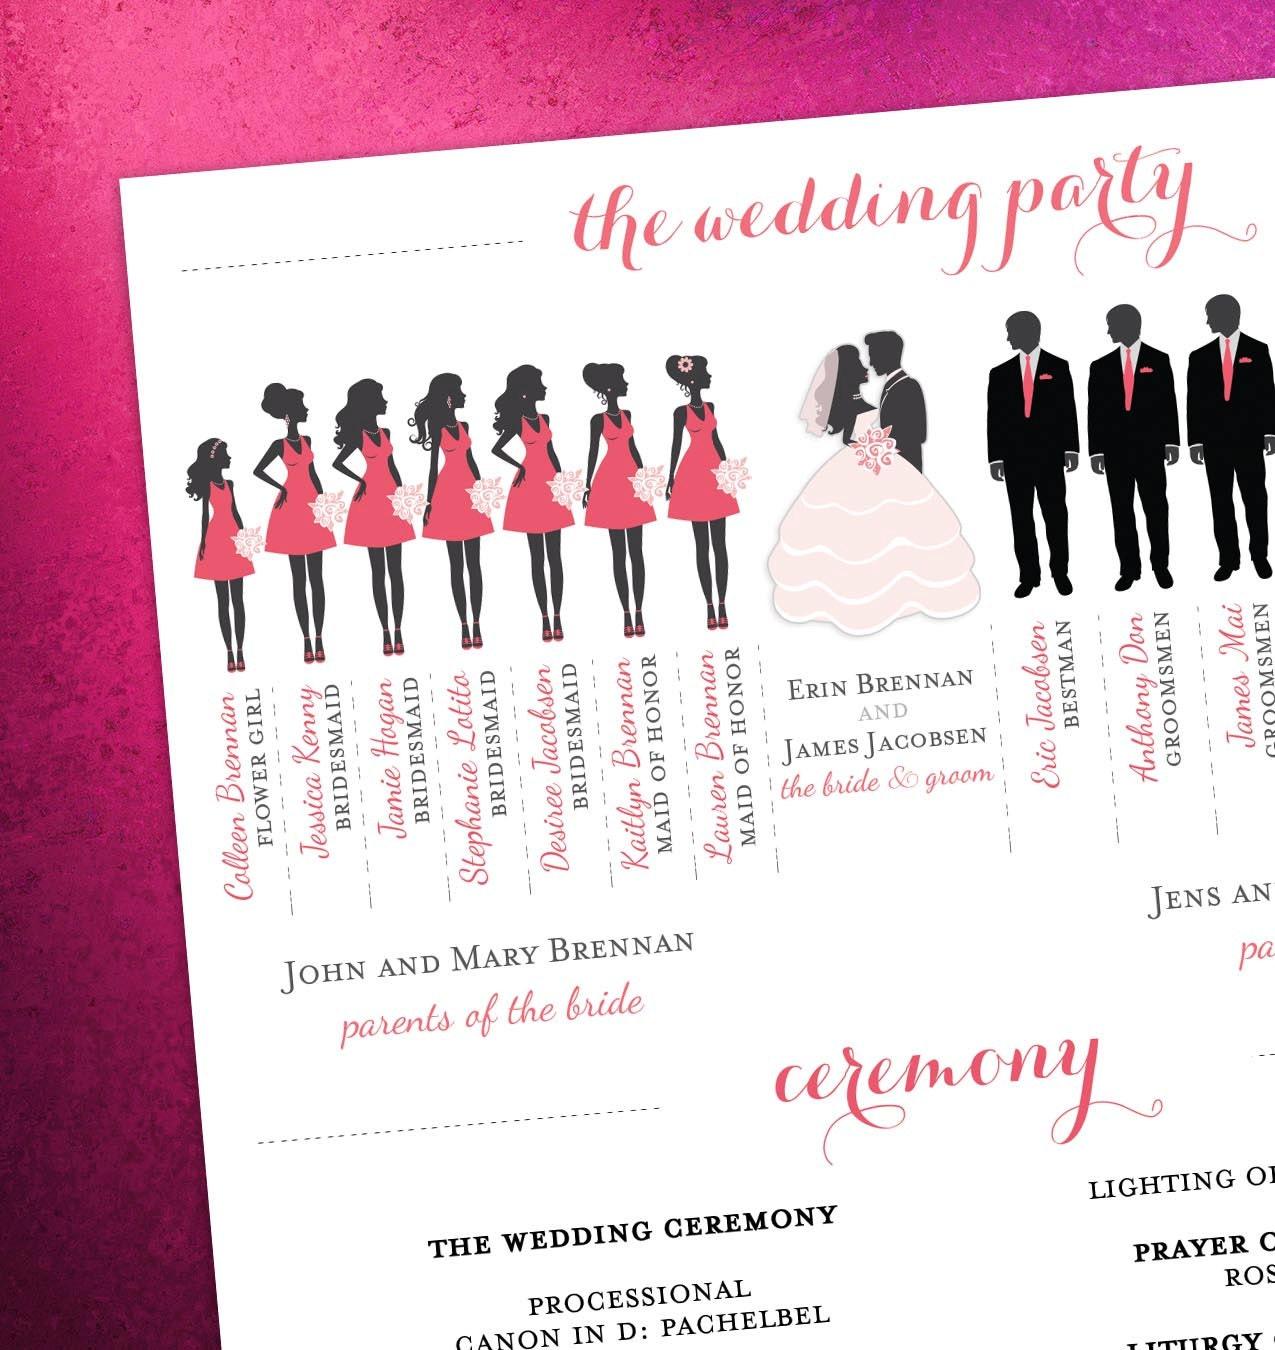 Bridesmaid Silhouette Clip Art Party silhouettes (digital